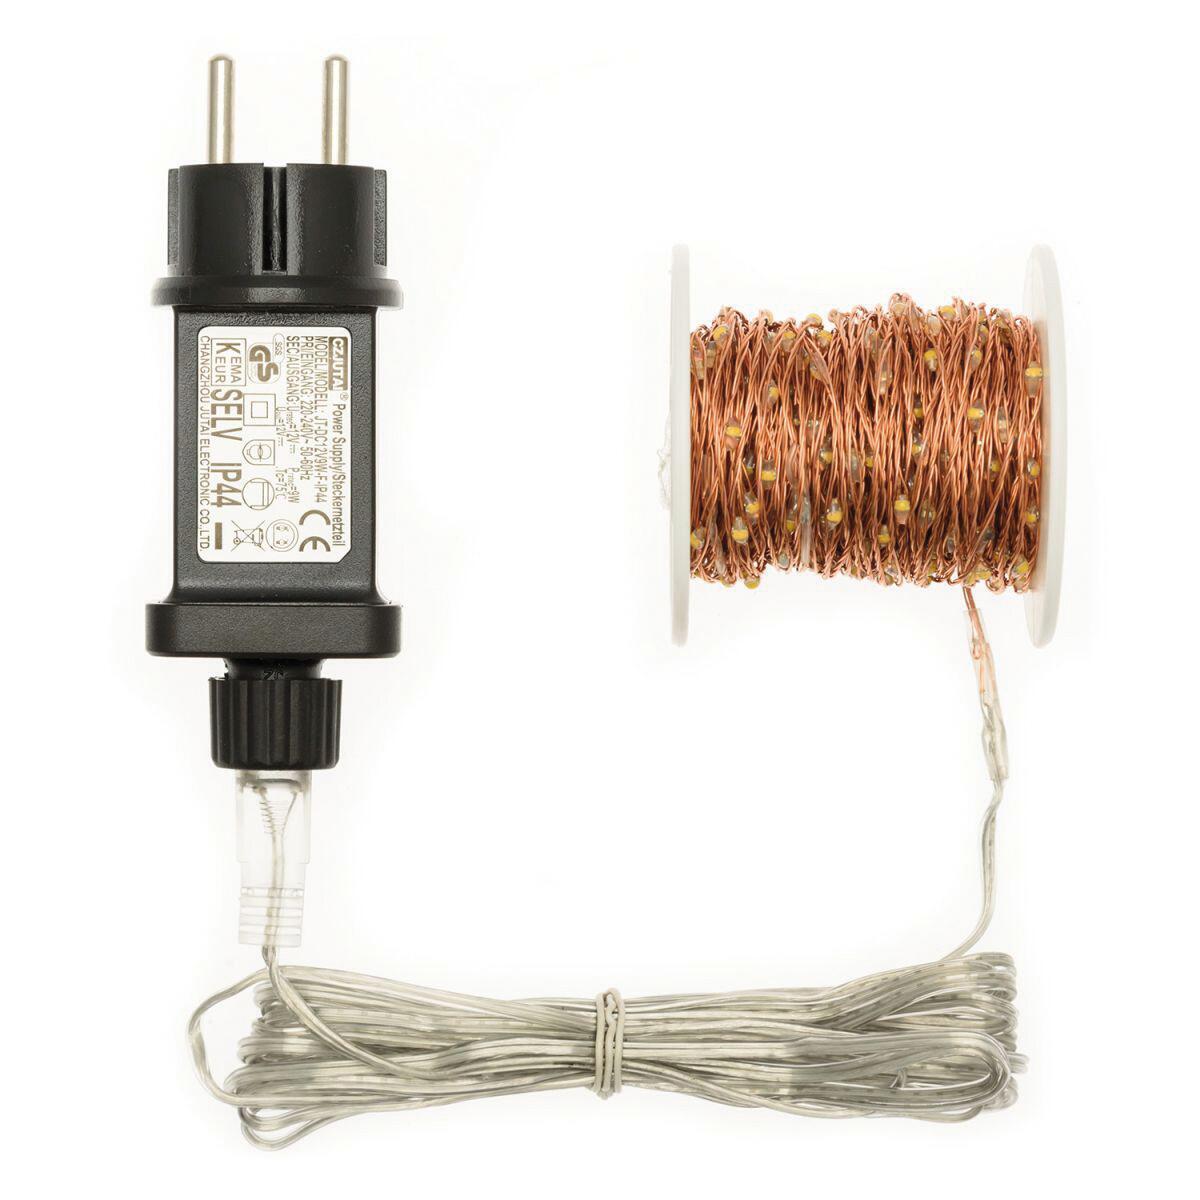 Catena luminosa 500 lampadine LED bianco caldo 37.5 m - 5